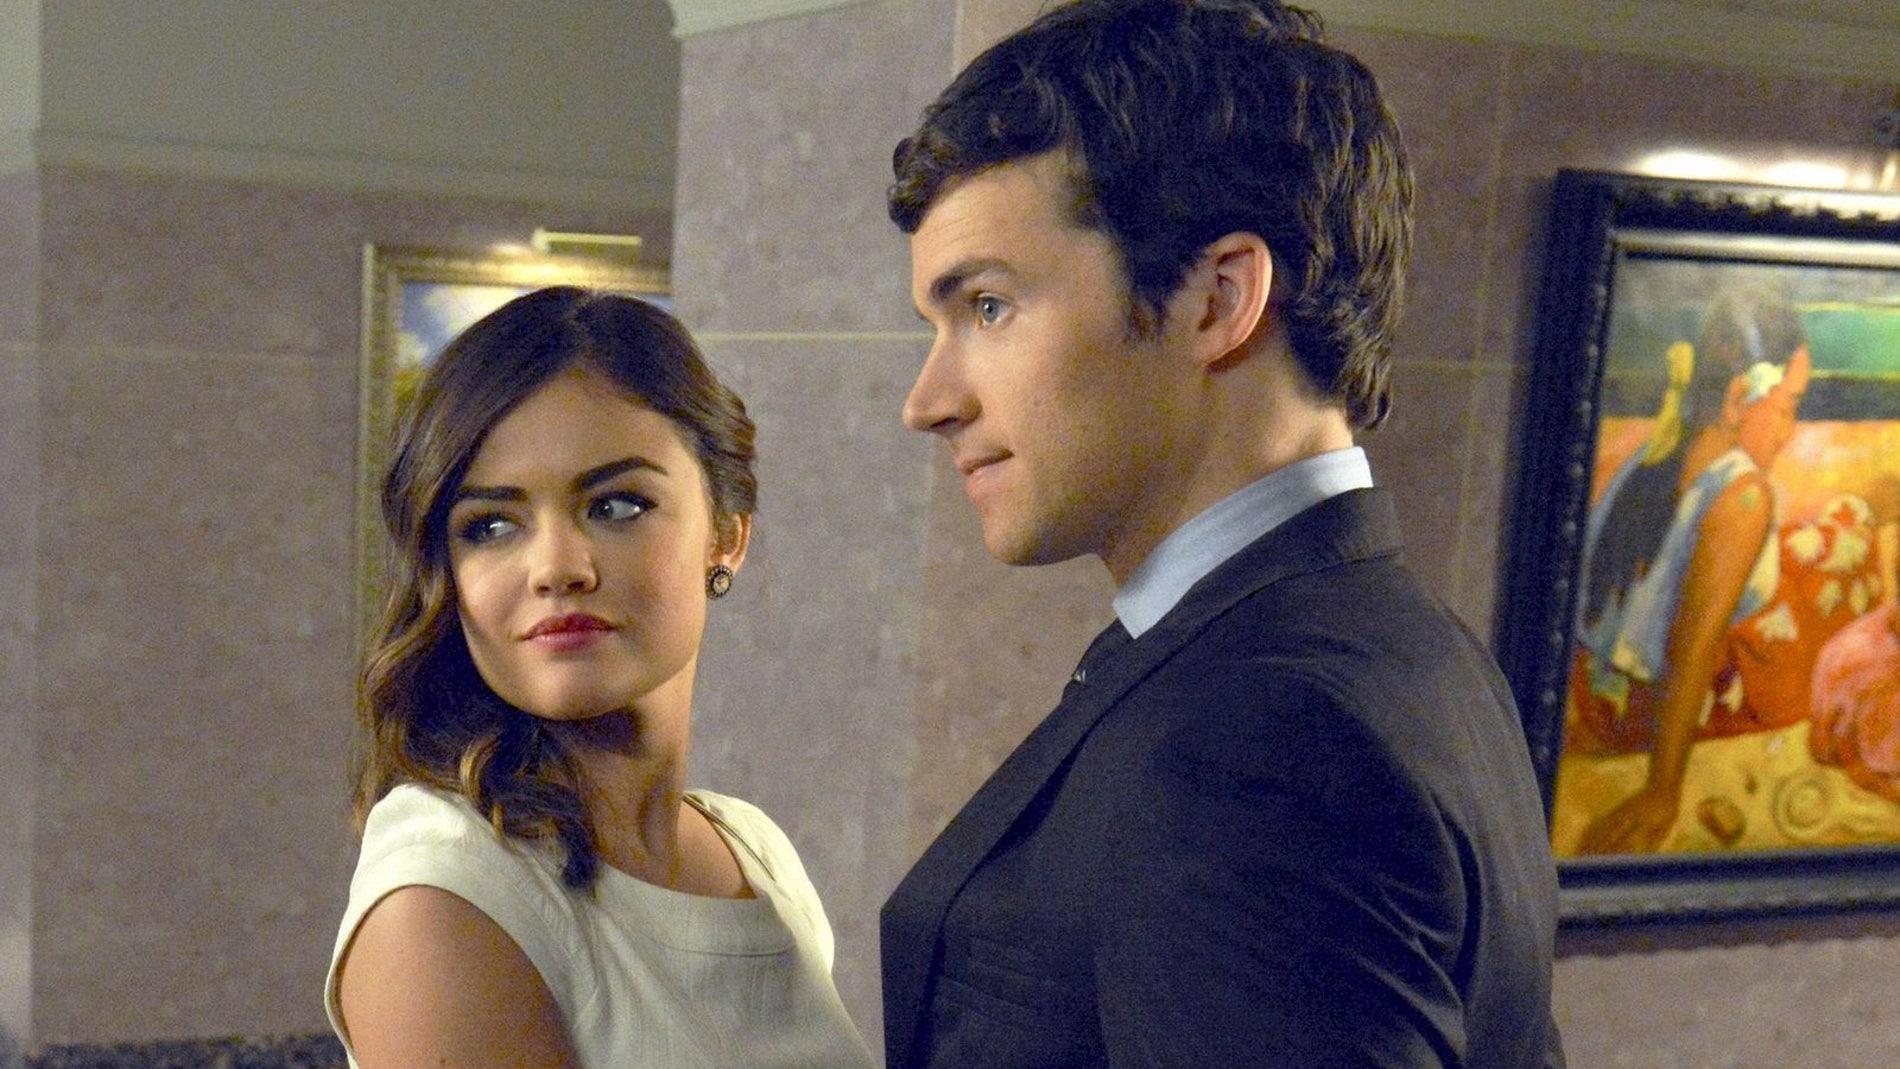 Ezra y Aria en 'Pretty Little Liars'